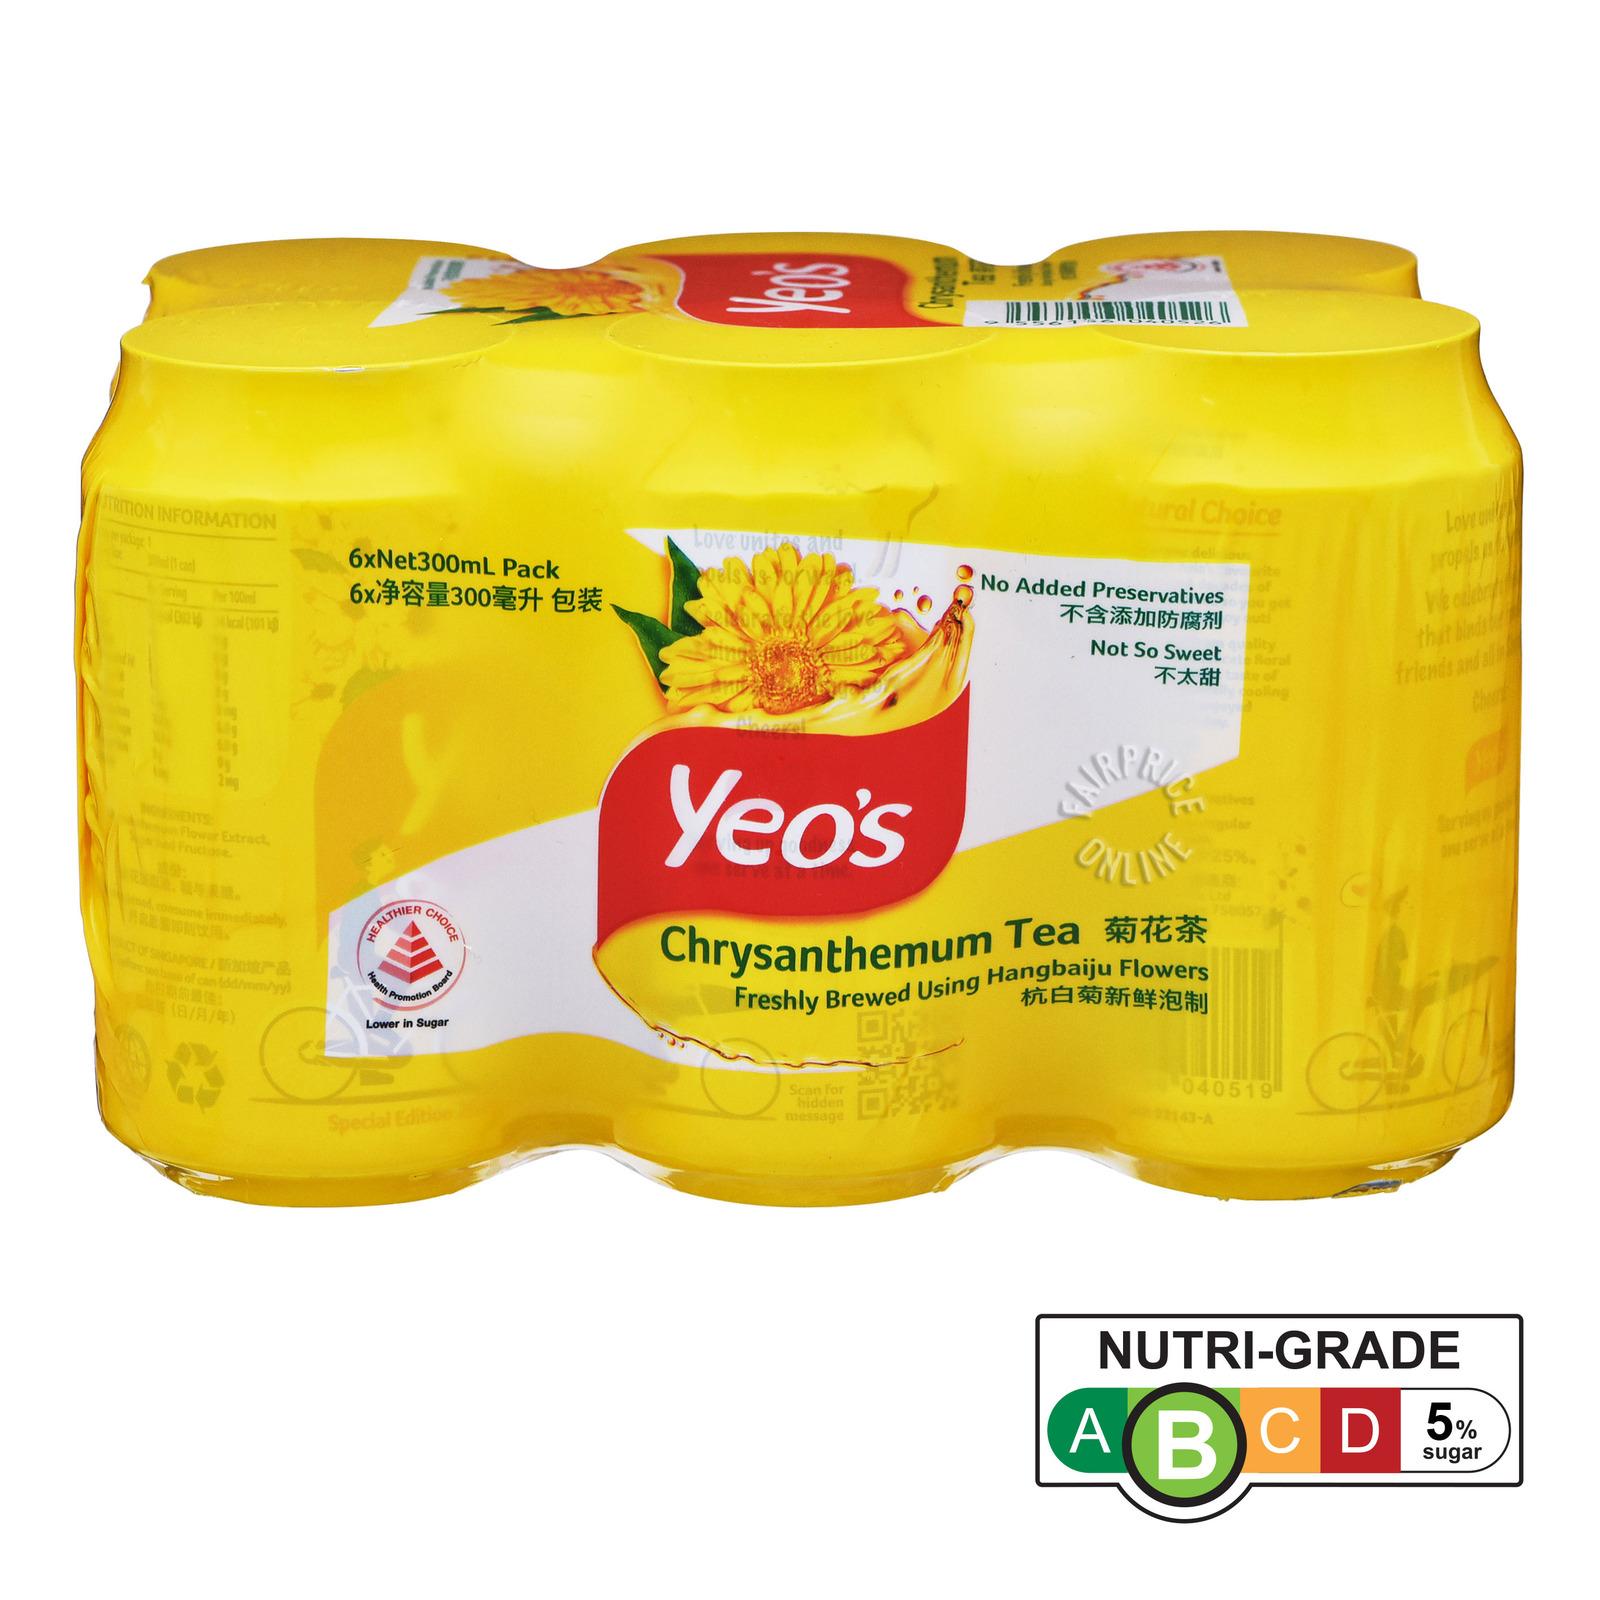 Yeo's Can Drink - Chrysanthemum Tea